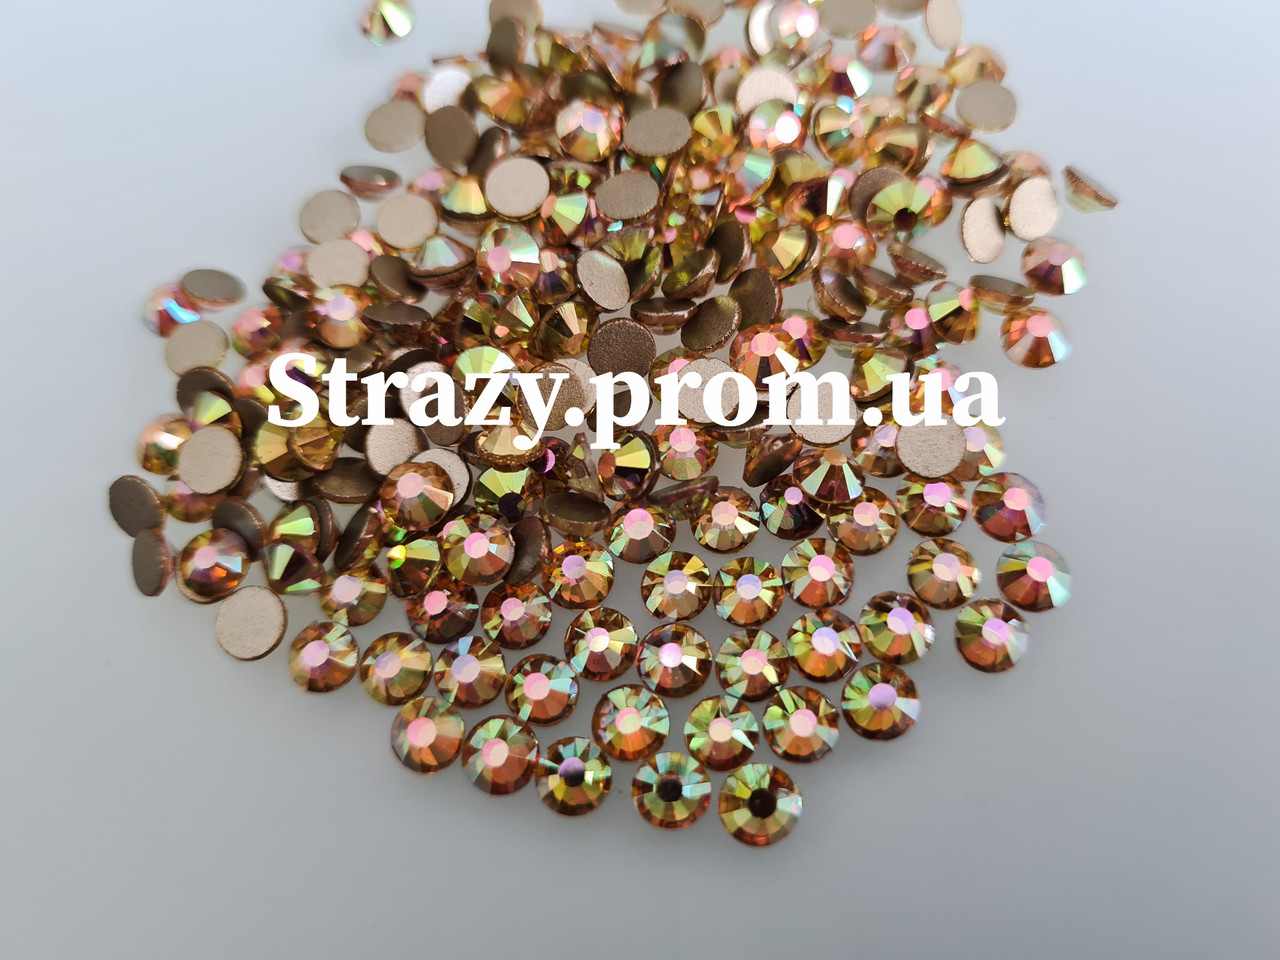 Стразы Lux ss20 Suneshine AB (5.0mm) 100шт